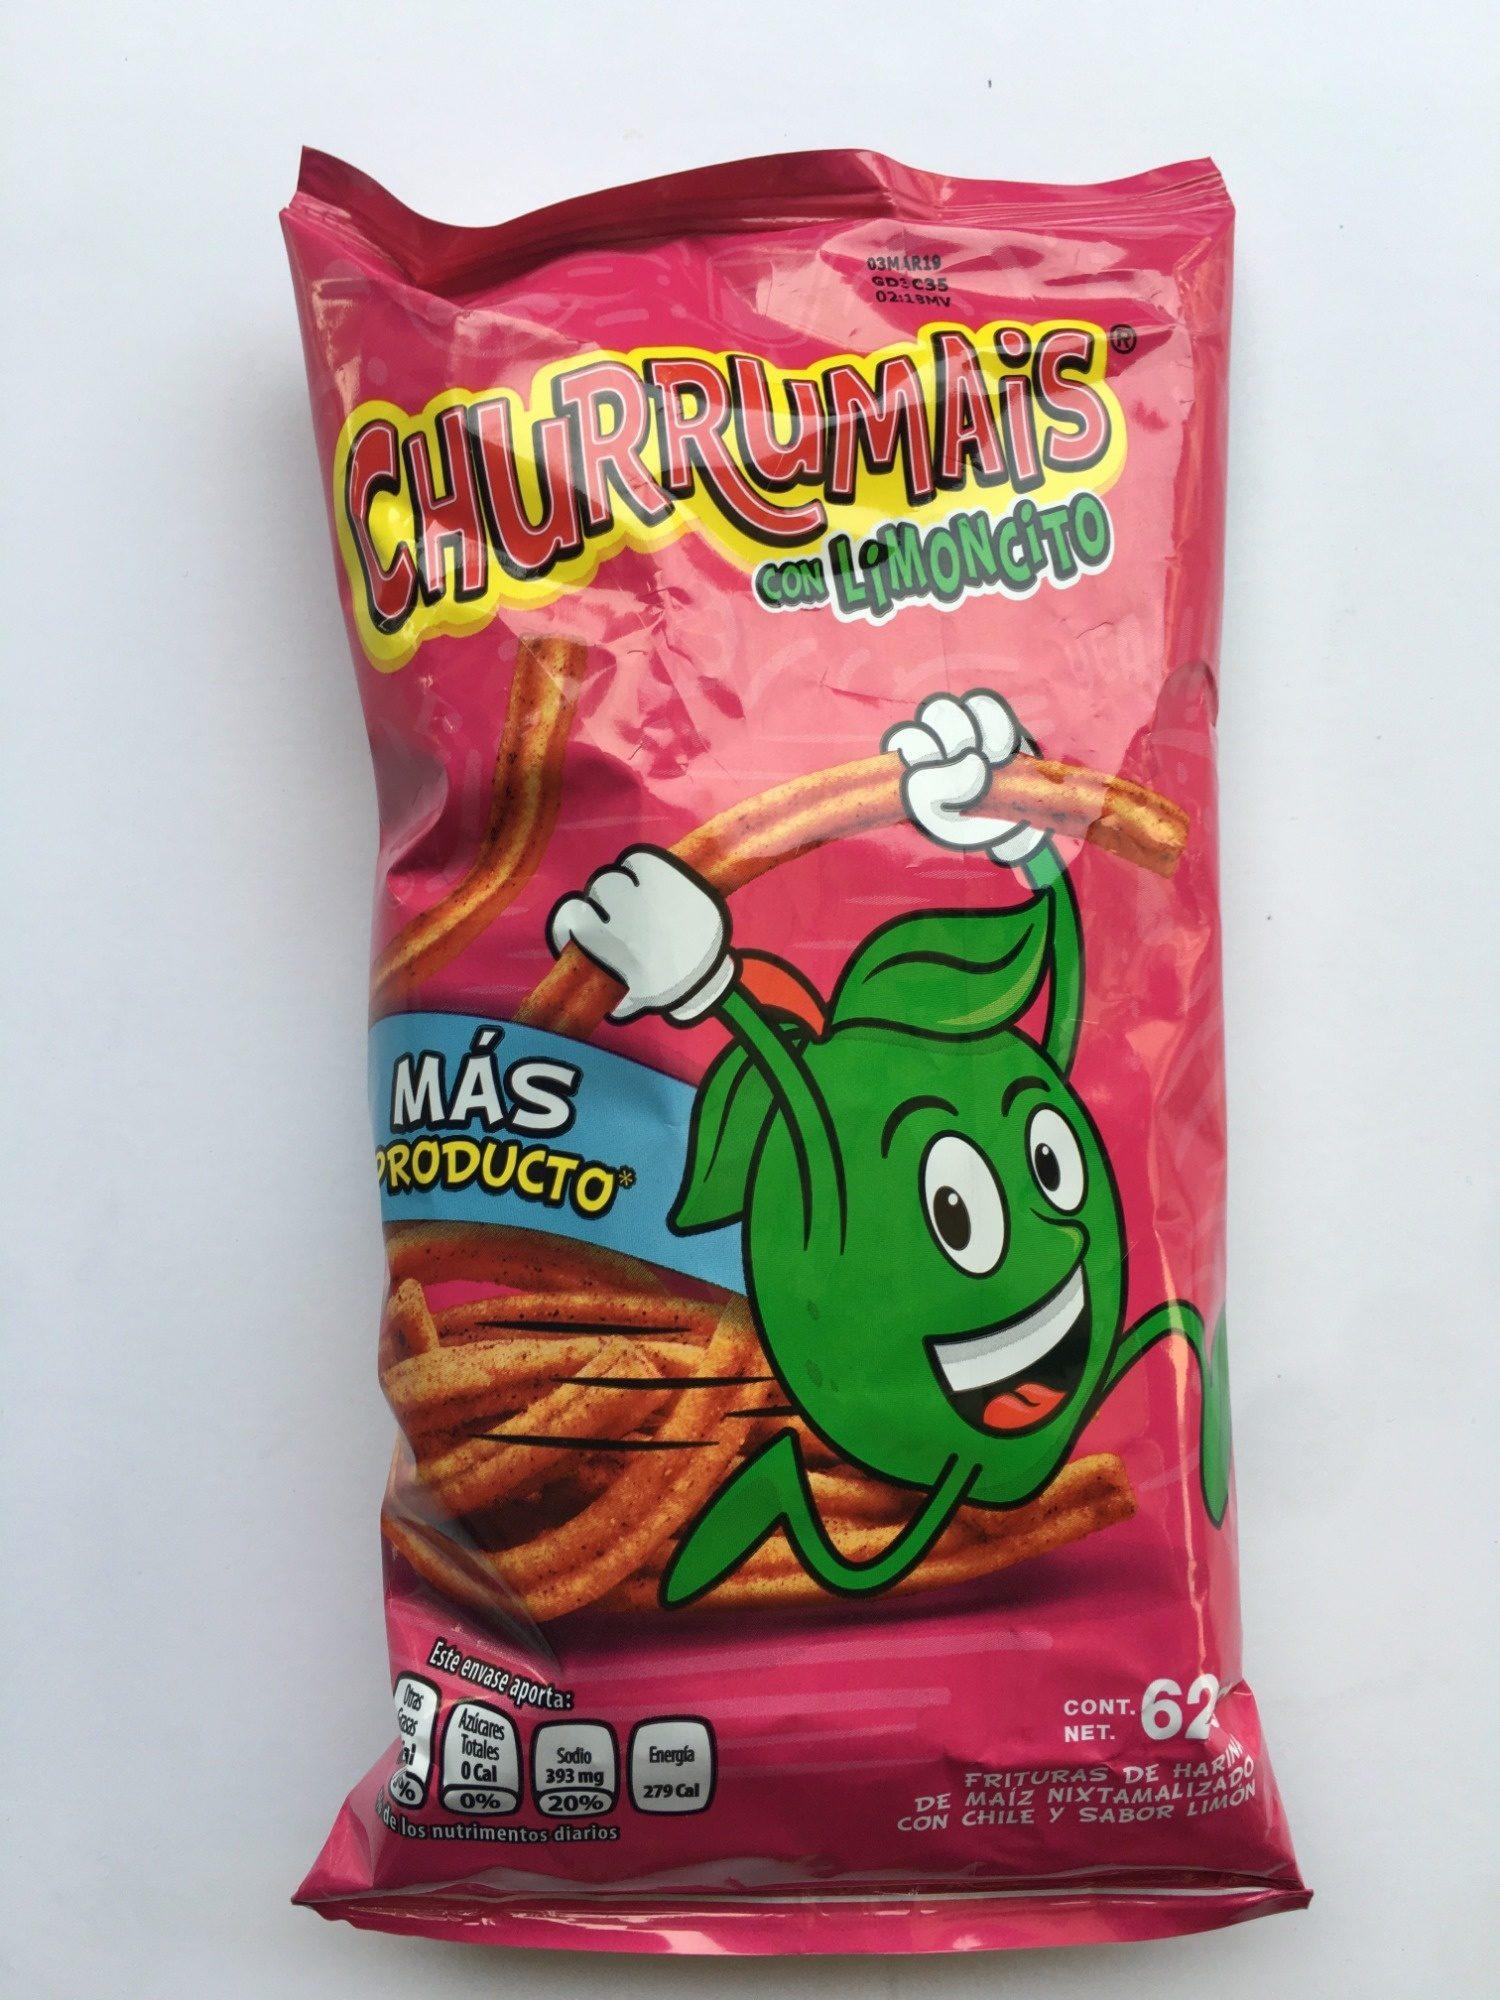 Churrumais con limoncito - Producto